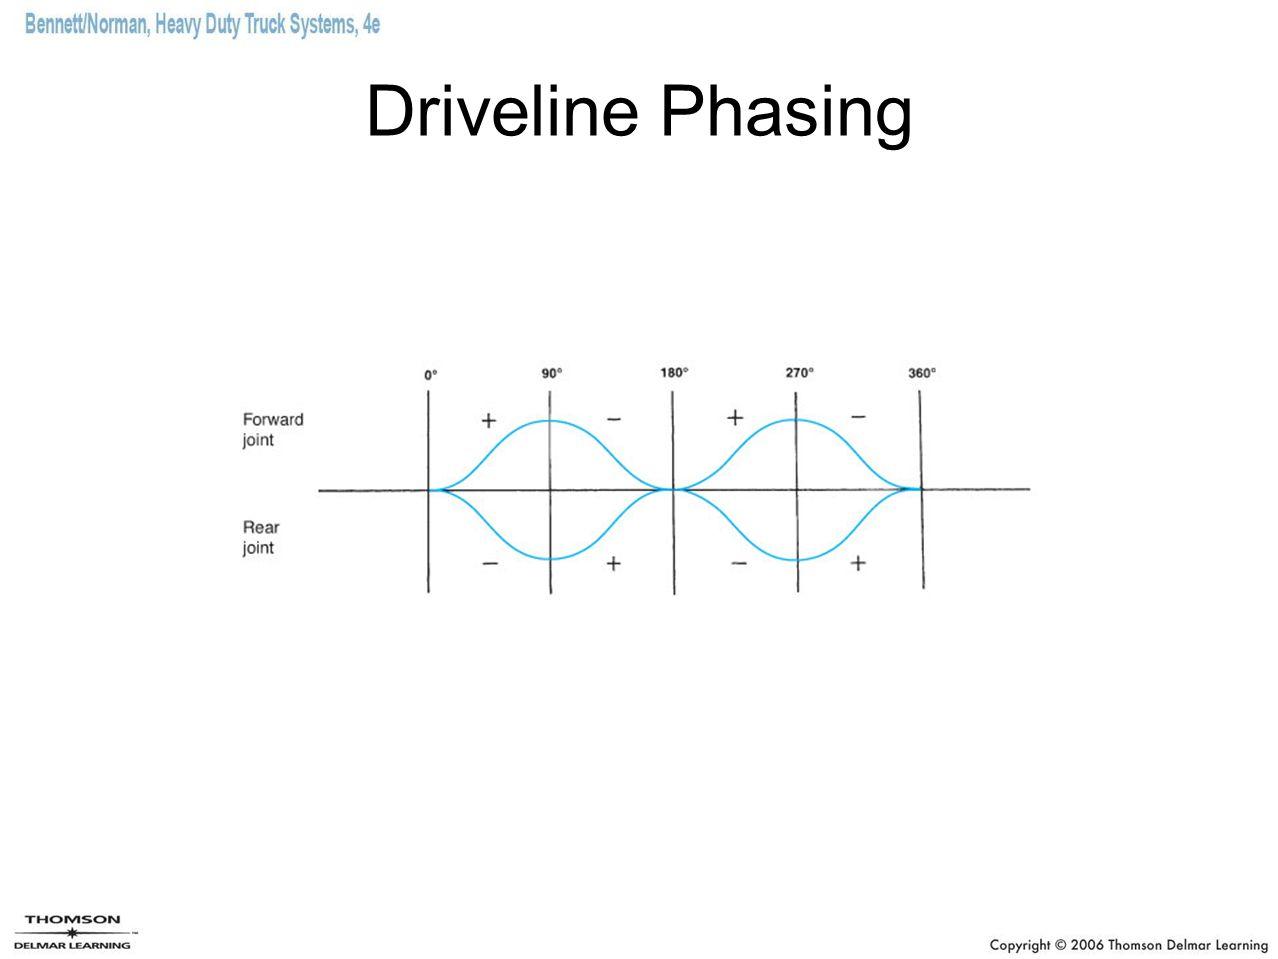 Driveline Phasing